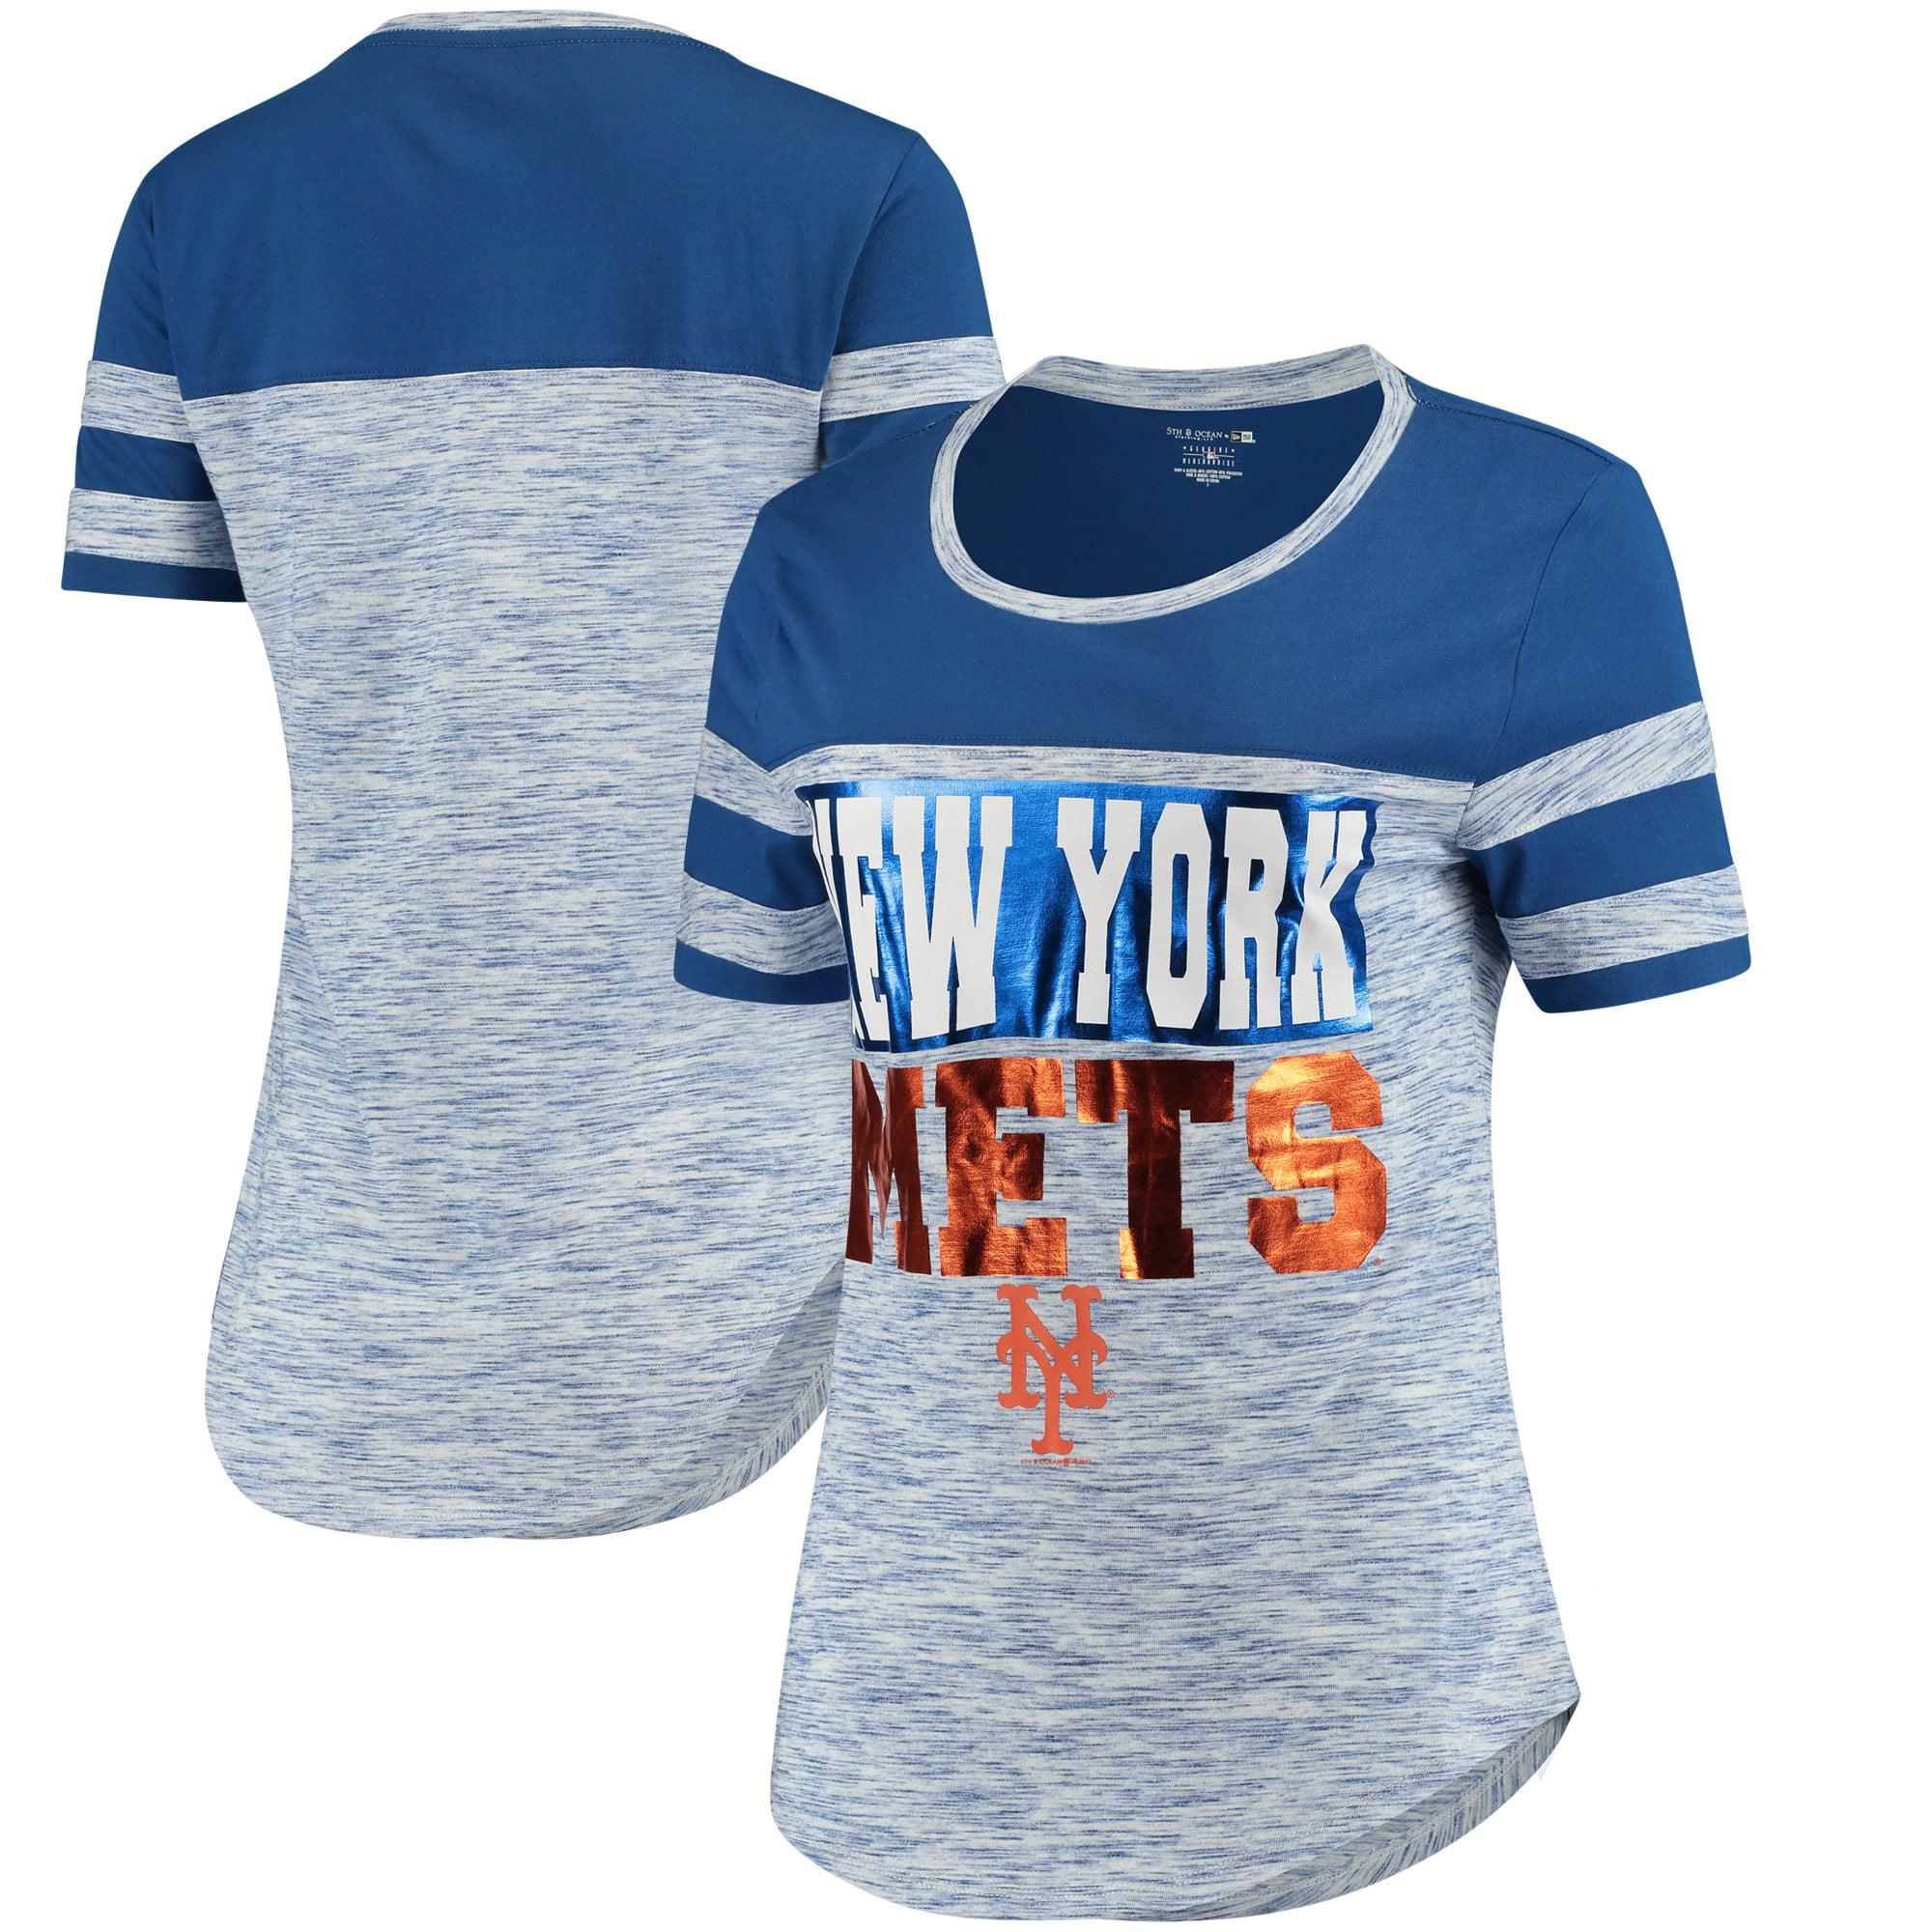 New York Mets 5th & Ocean by New Era Women's Space Dye Crew T-Shirt - Royal